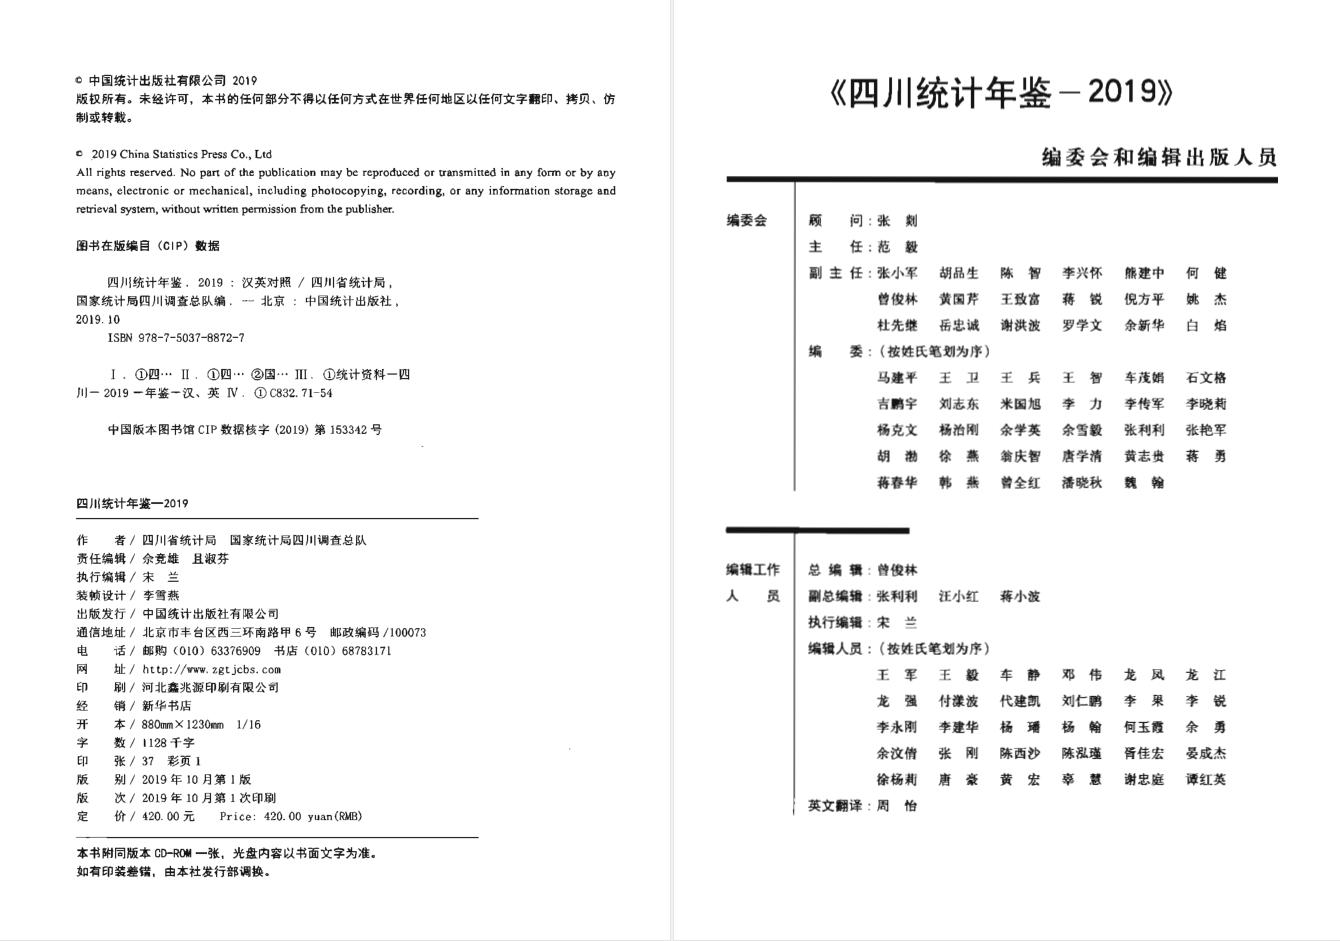 四川省统计年鉴2000-2019